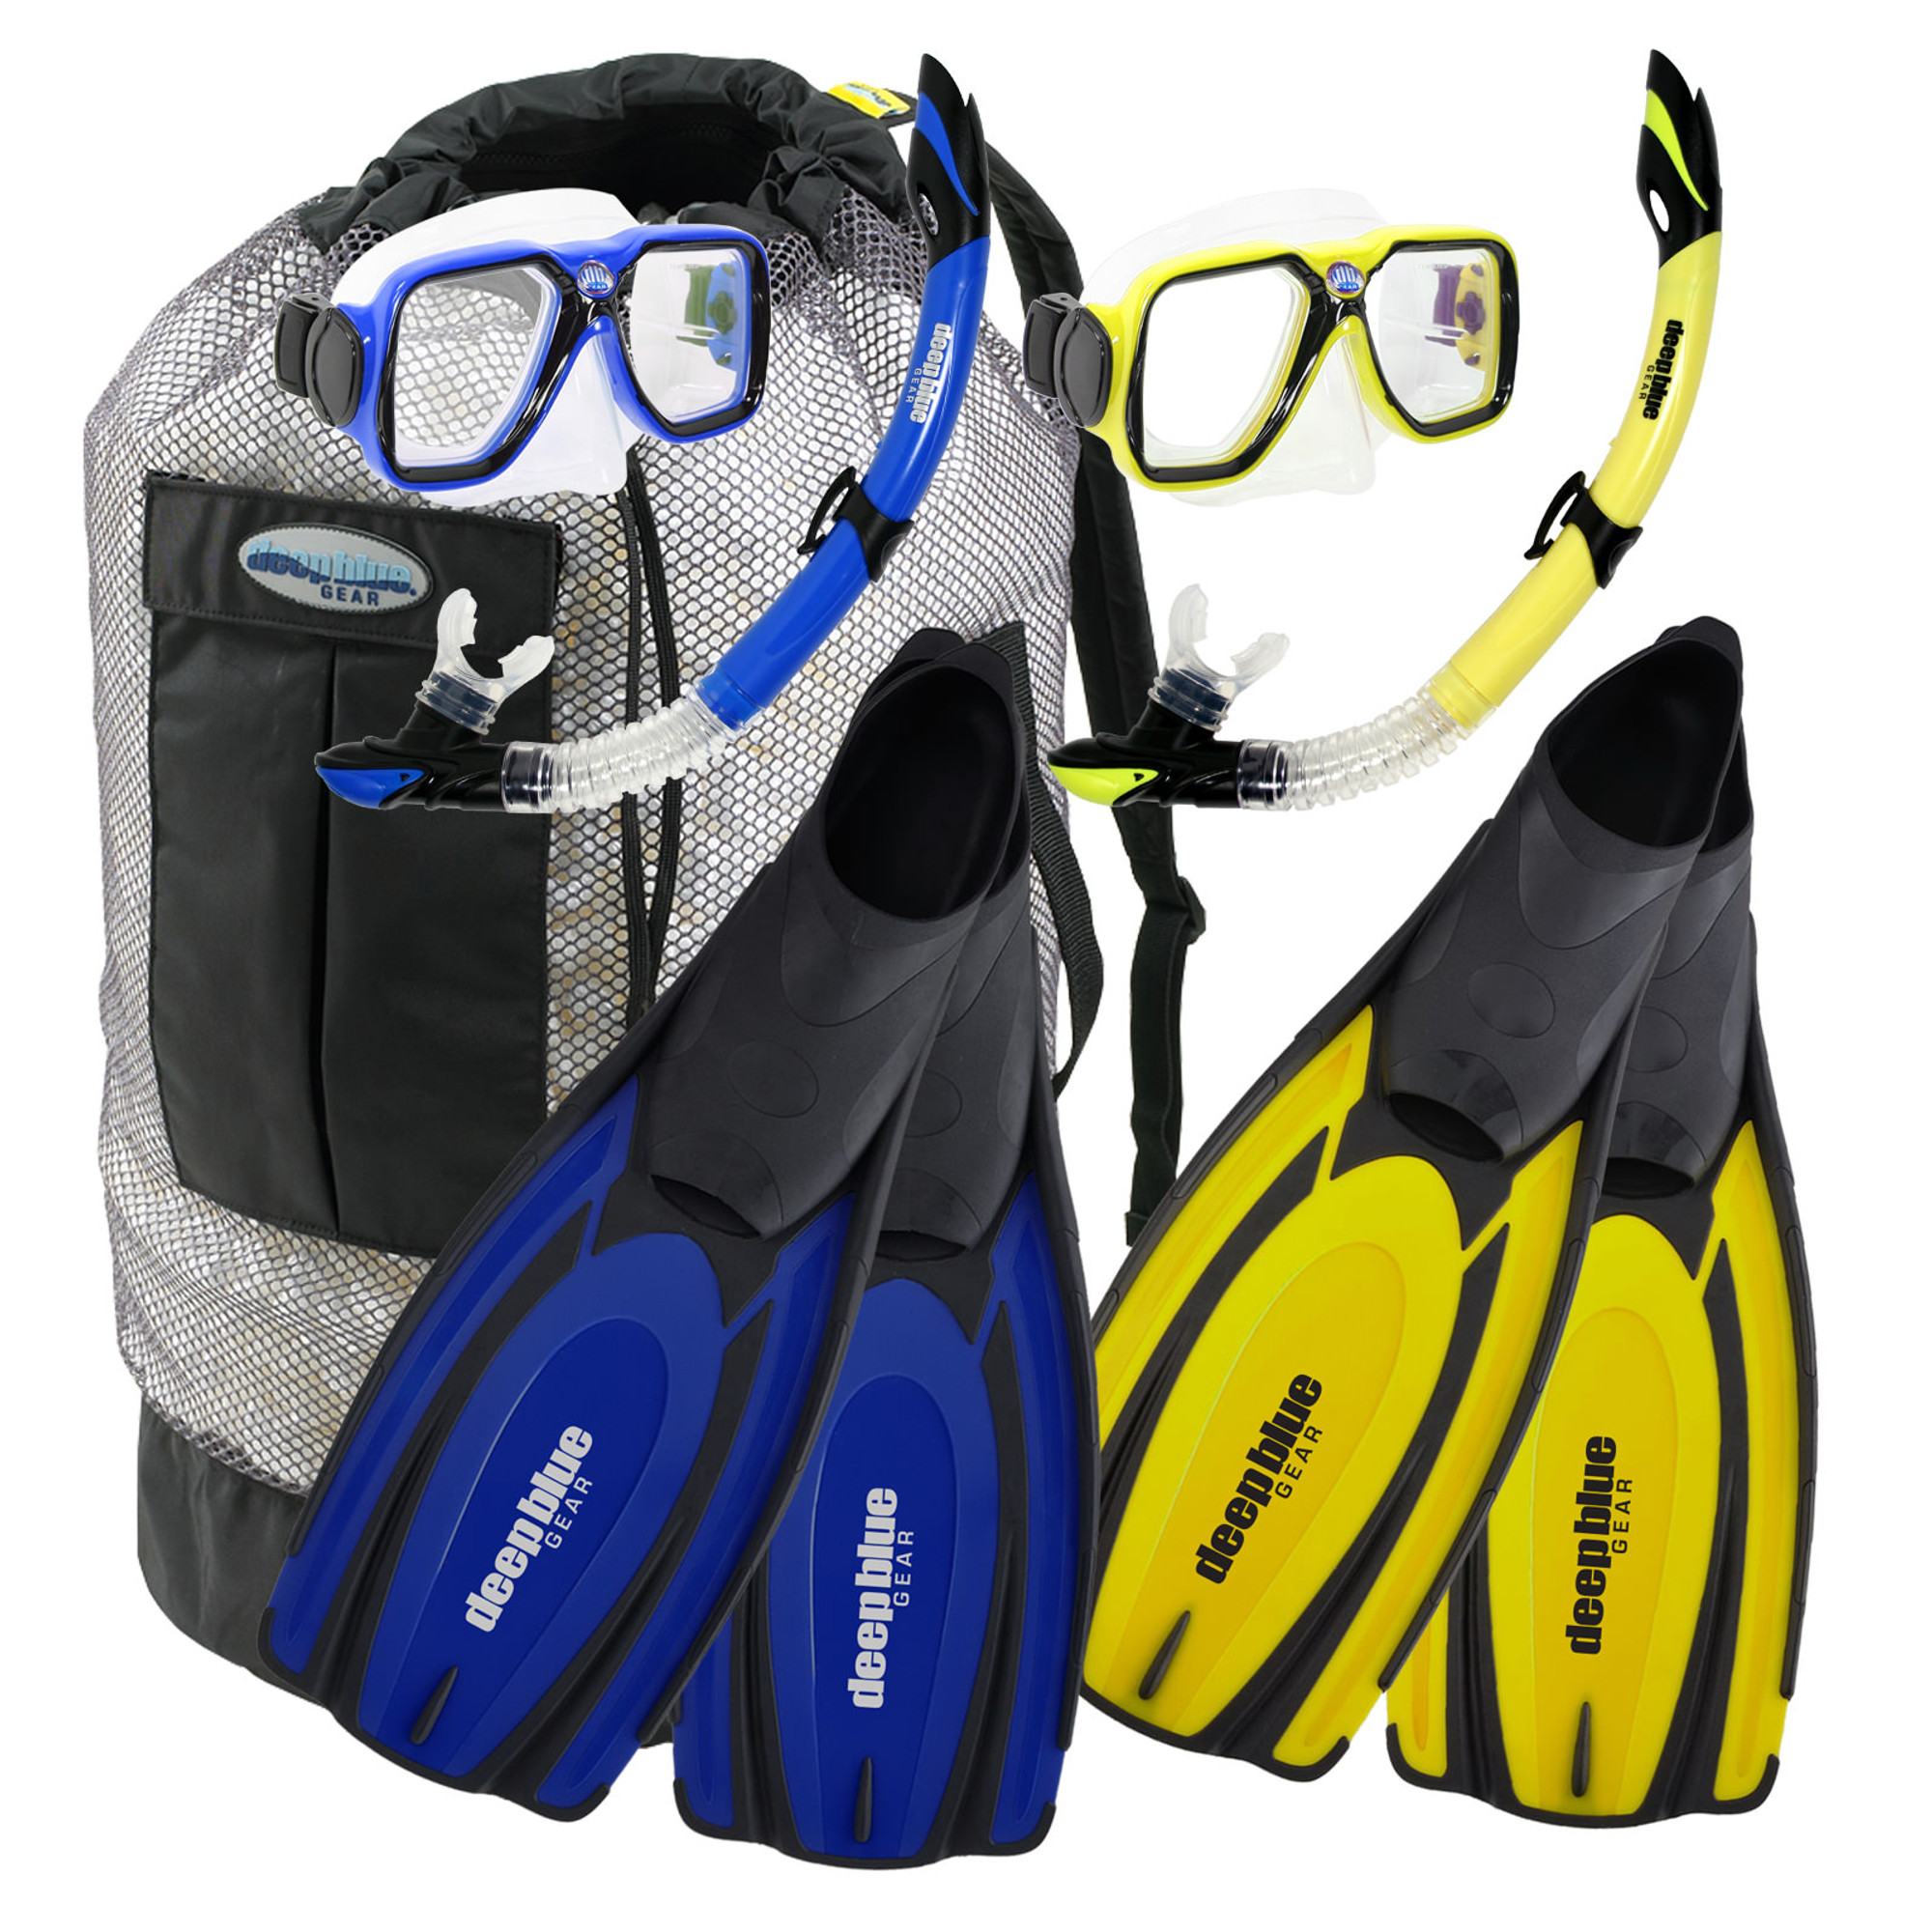 Buddy - Adult Snorkeling Set